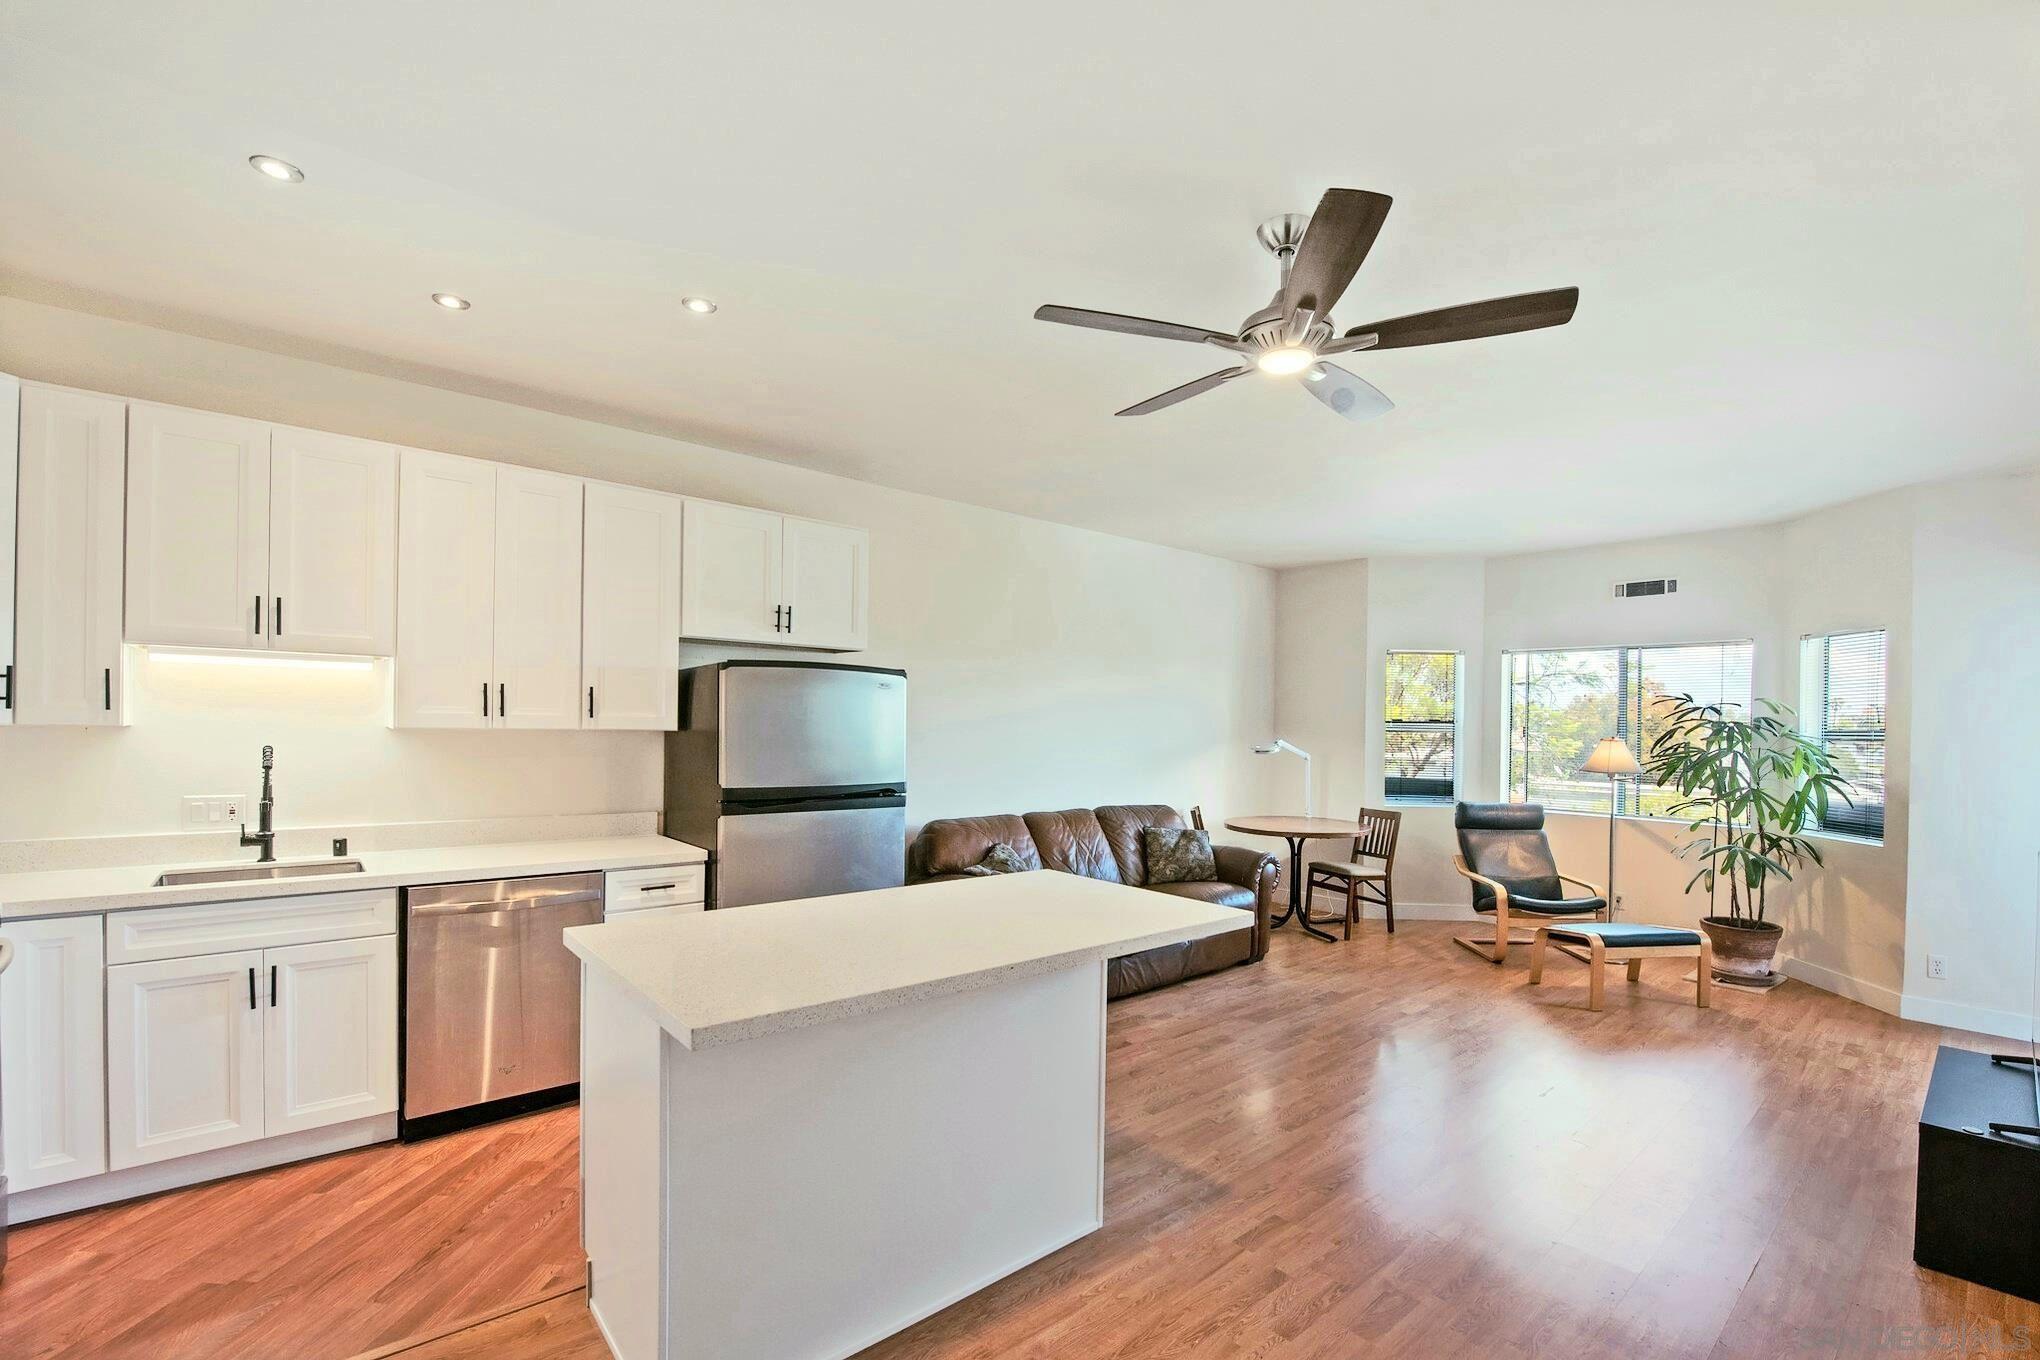 Main Photo: NORTH PARK Condo for sale : 1 bedrooms : 3760 Florida #107 in San Diego